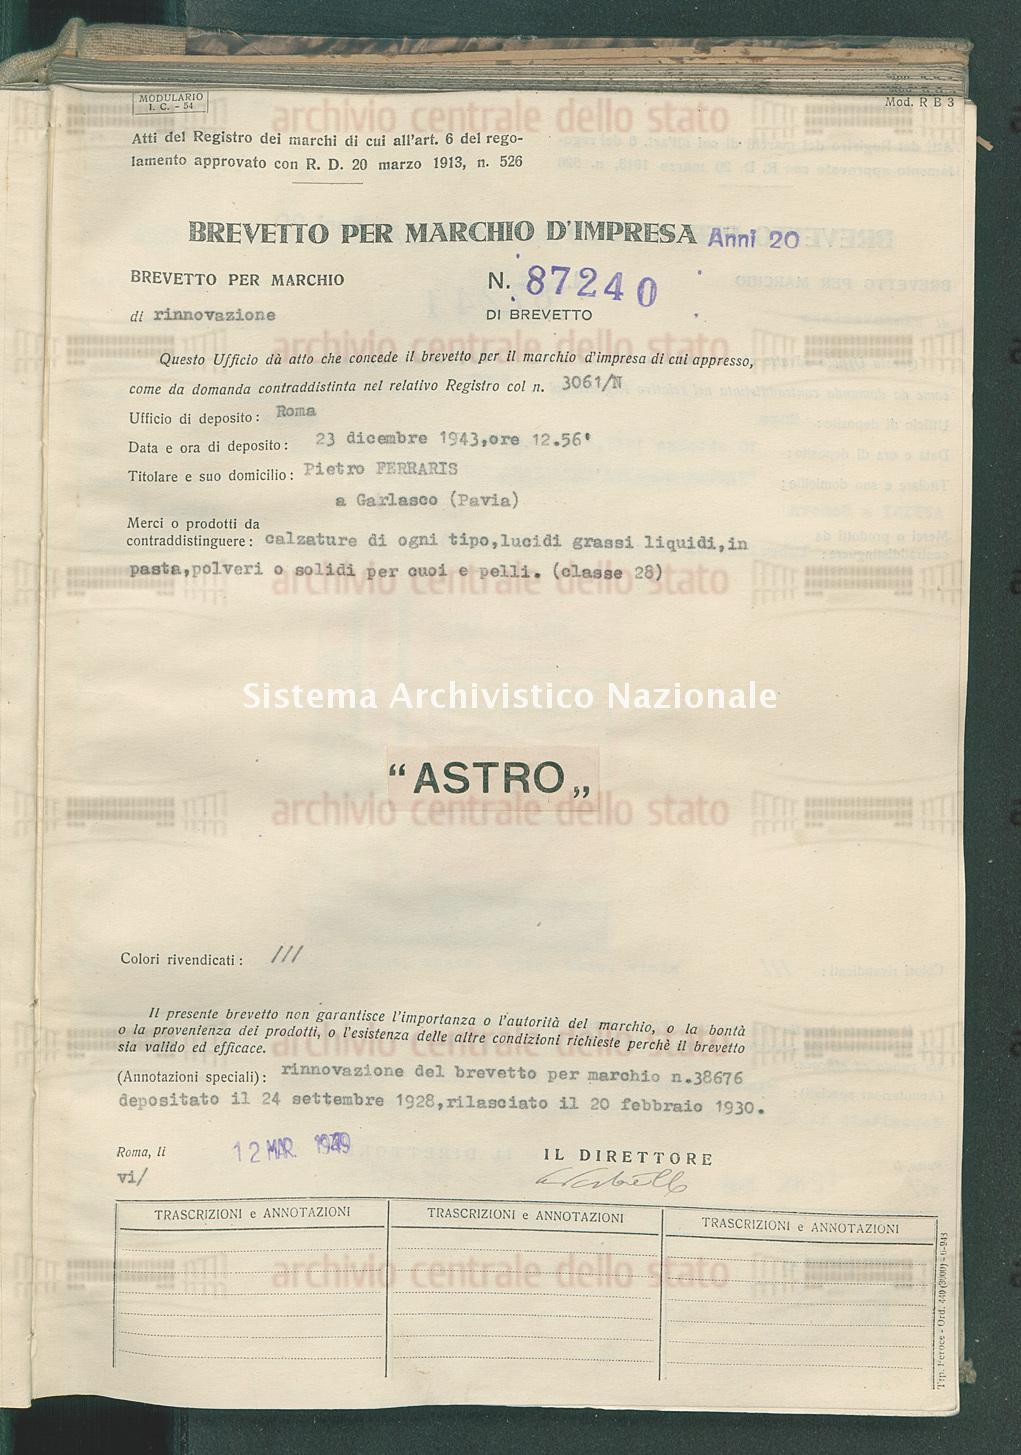 Calzature di ogni tipo, lucidi grassi liquidi, in pasta, polveri ecc. Pietro Ferraris (12/03/1949)